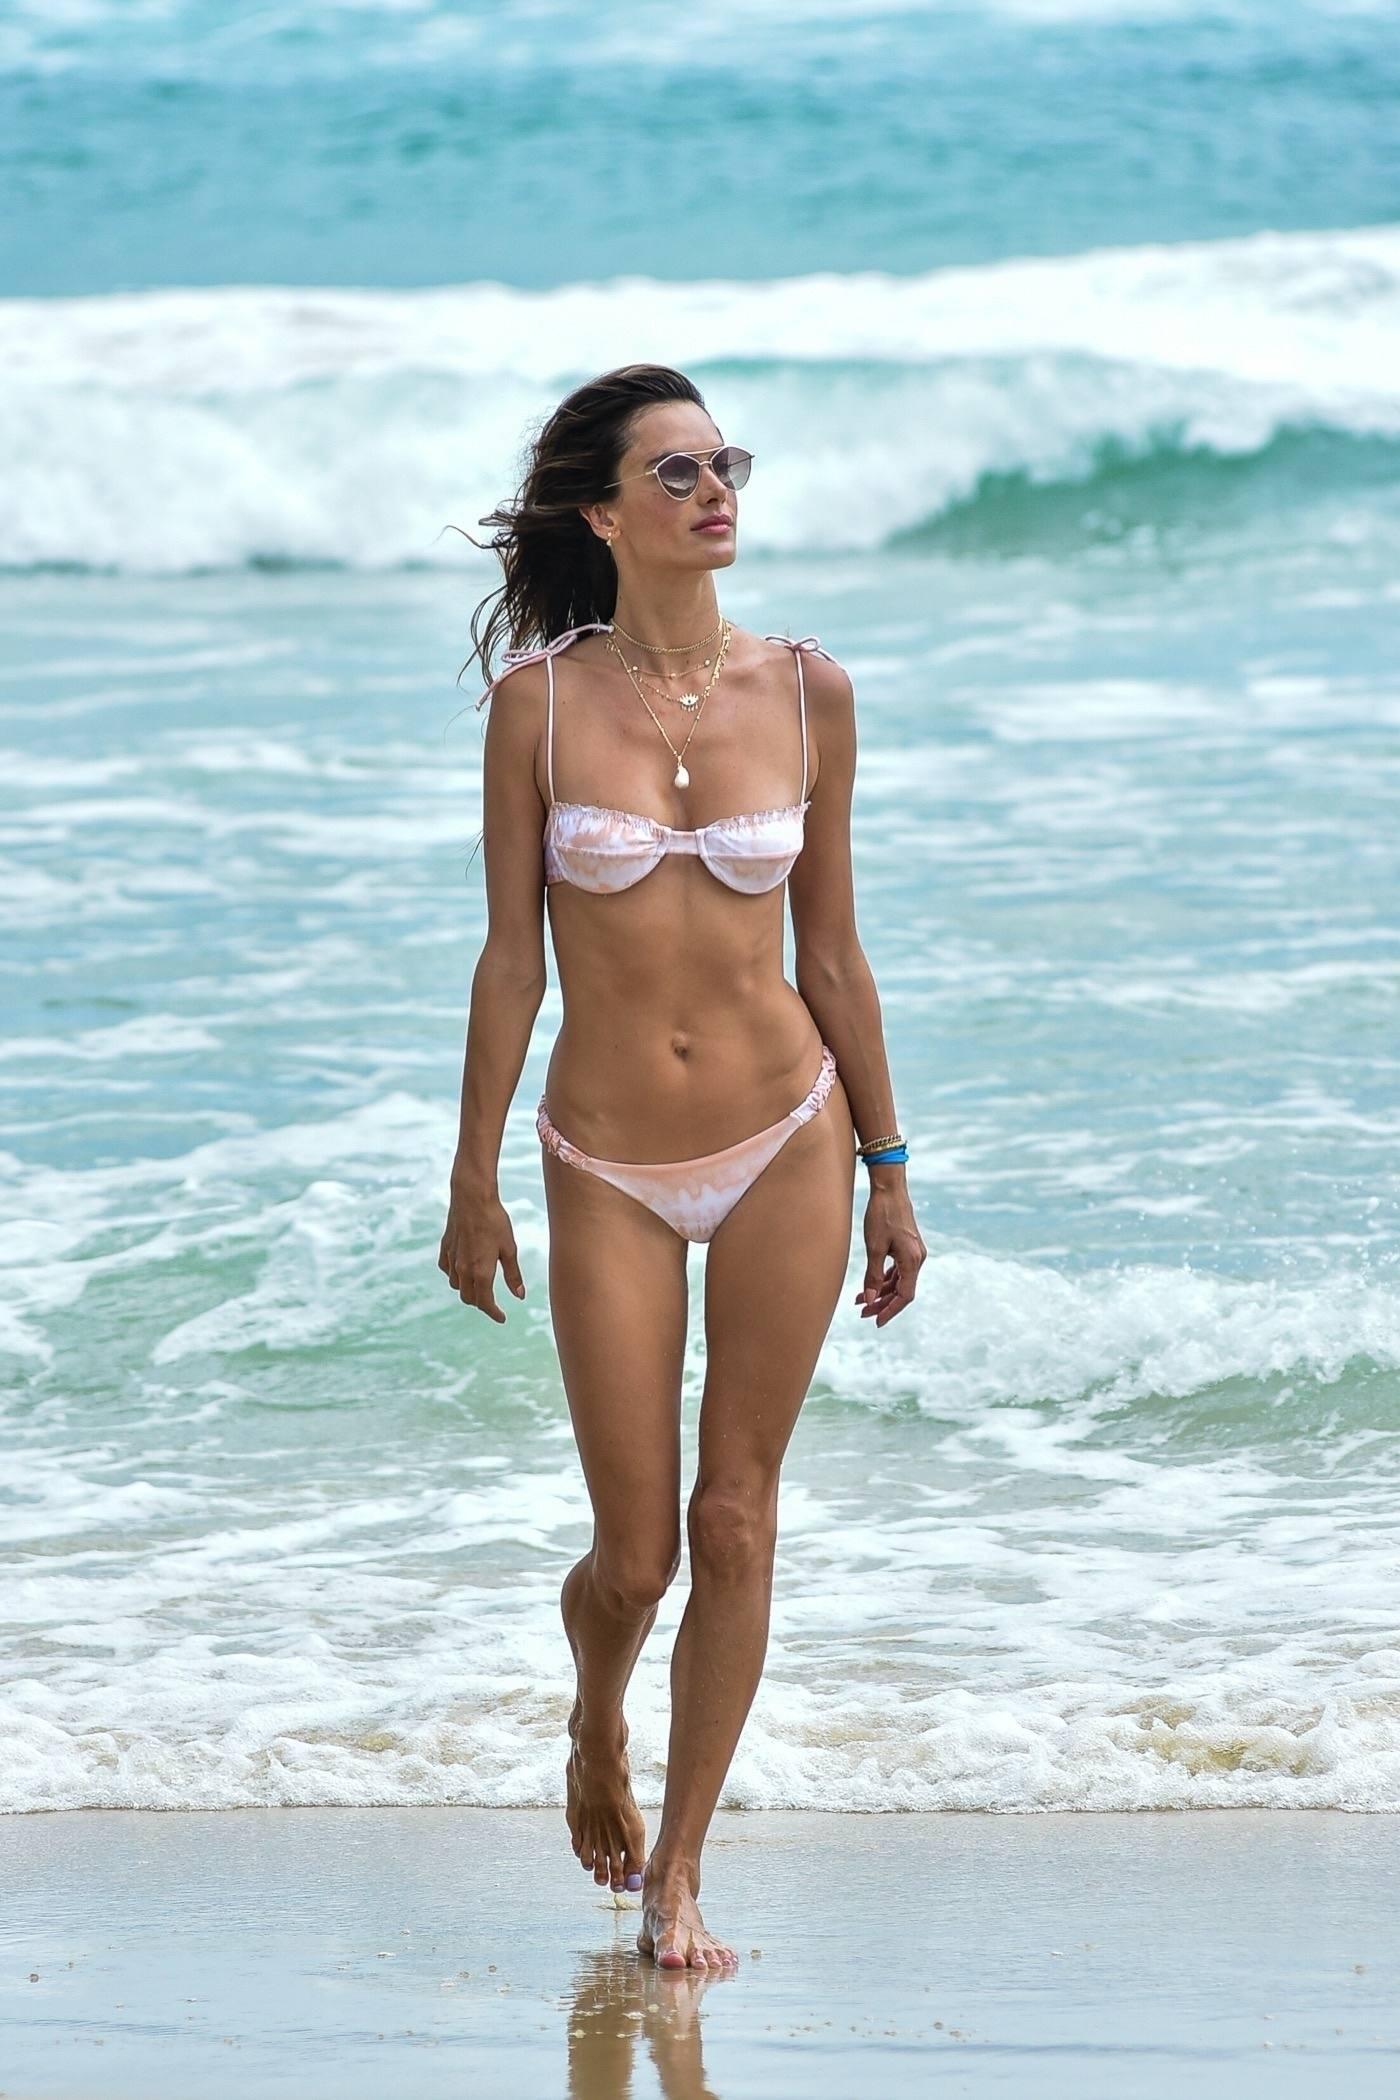 Alessandra Ambrosio In Tiny Bikini